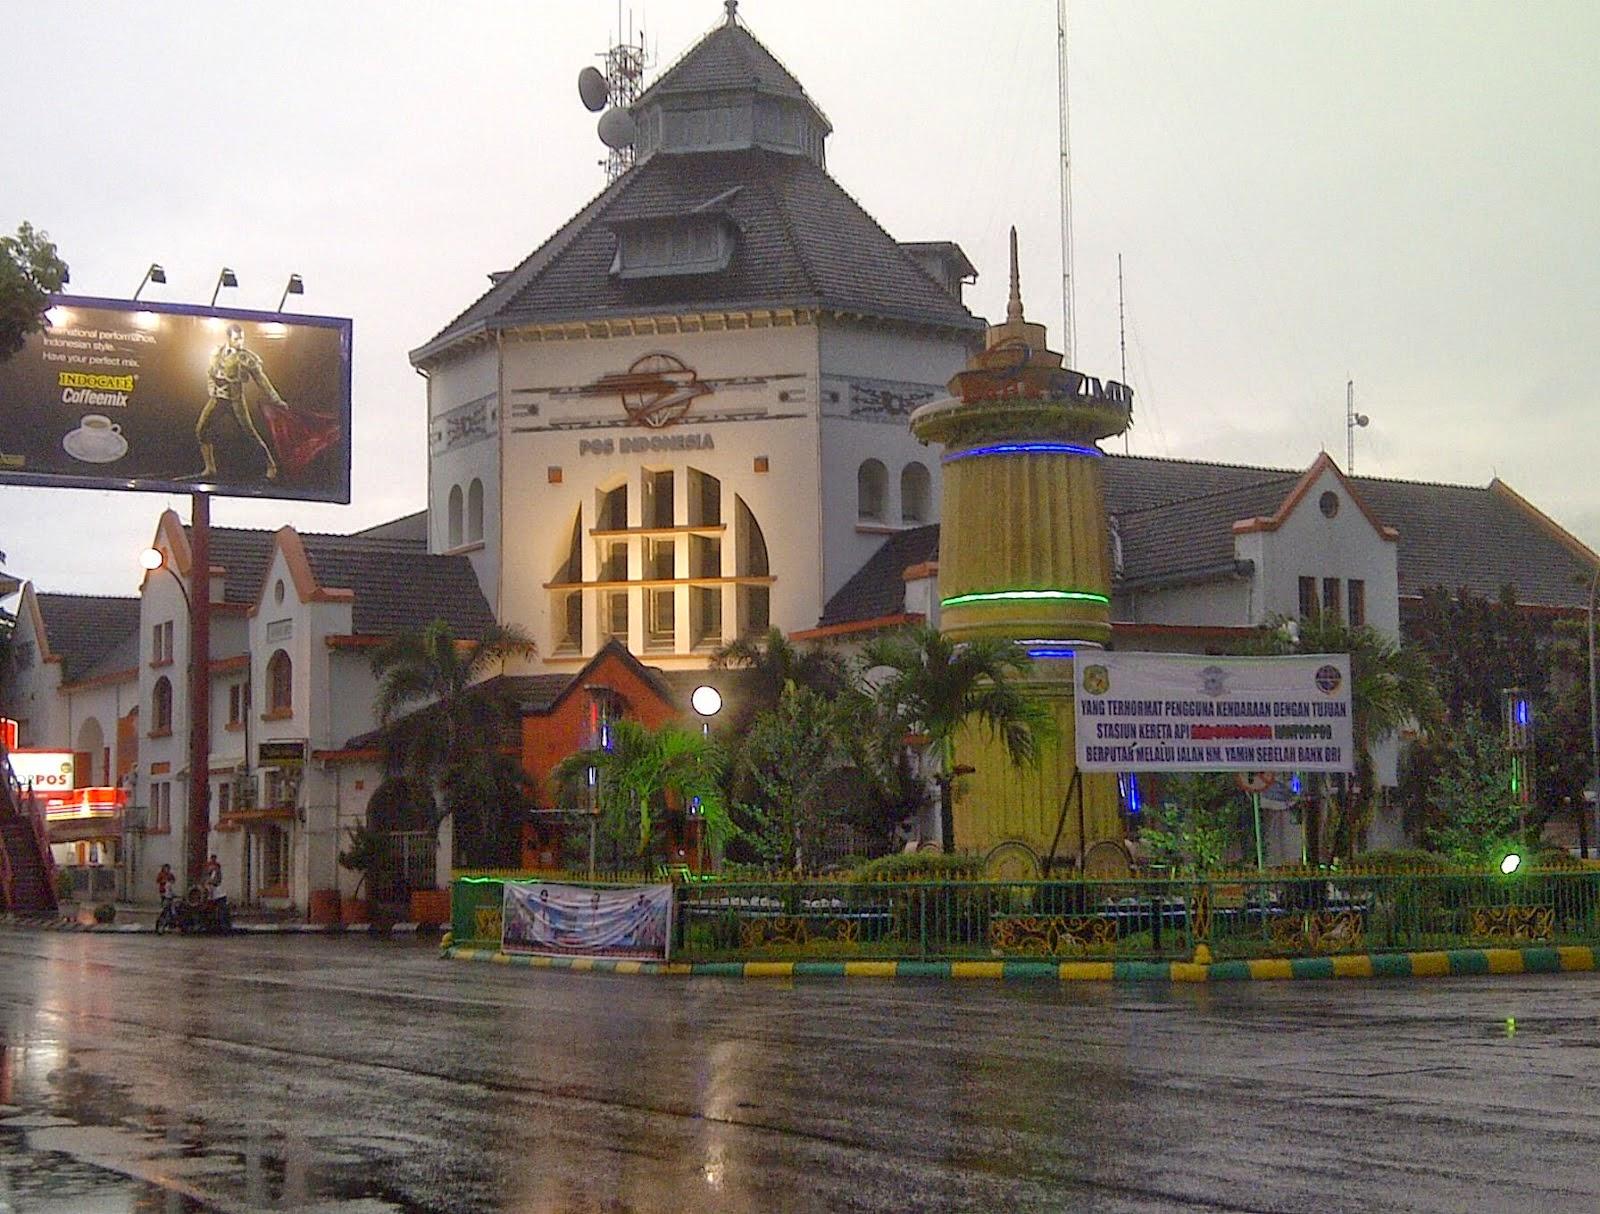 ROFARA WISATA INDONESIA